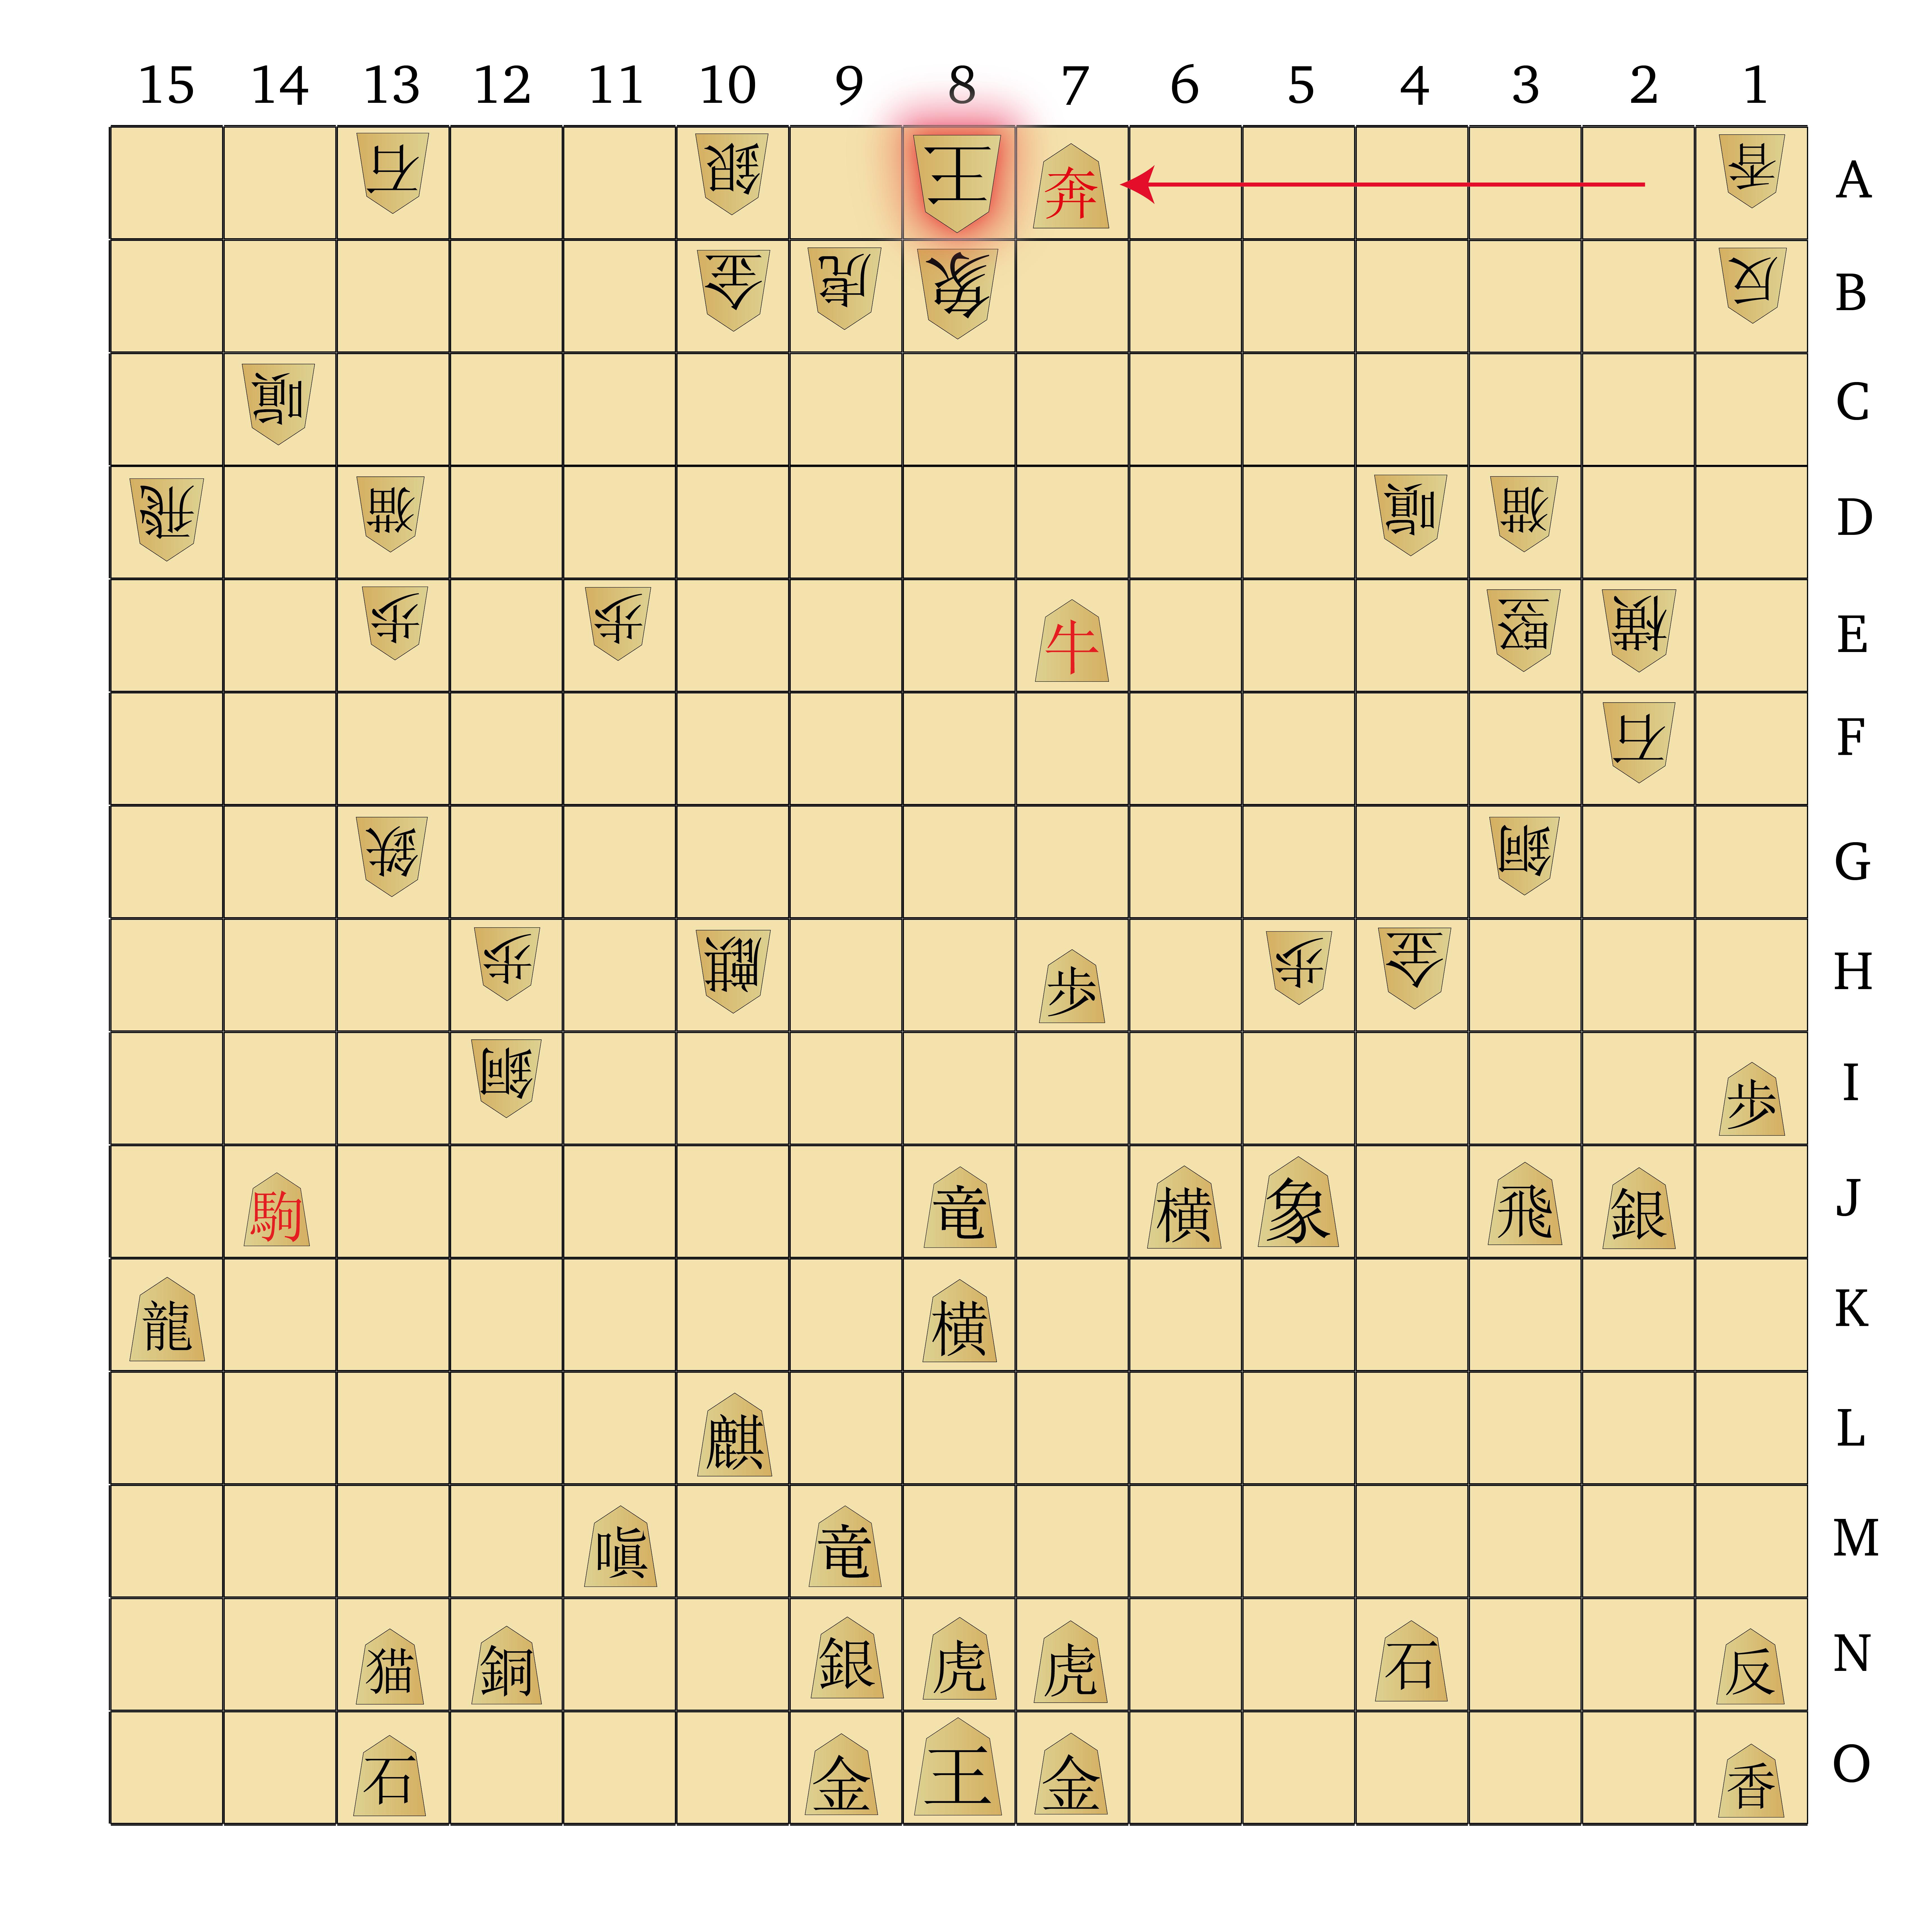 Dai Shogi 420 -- Move 441-01